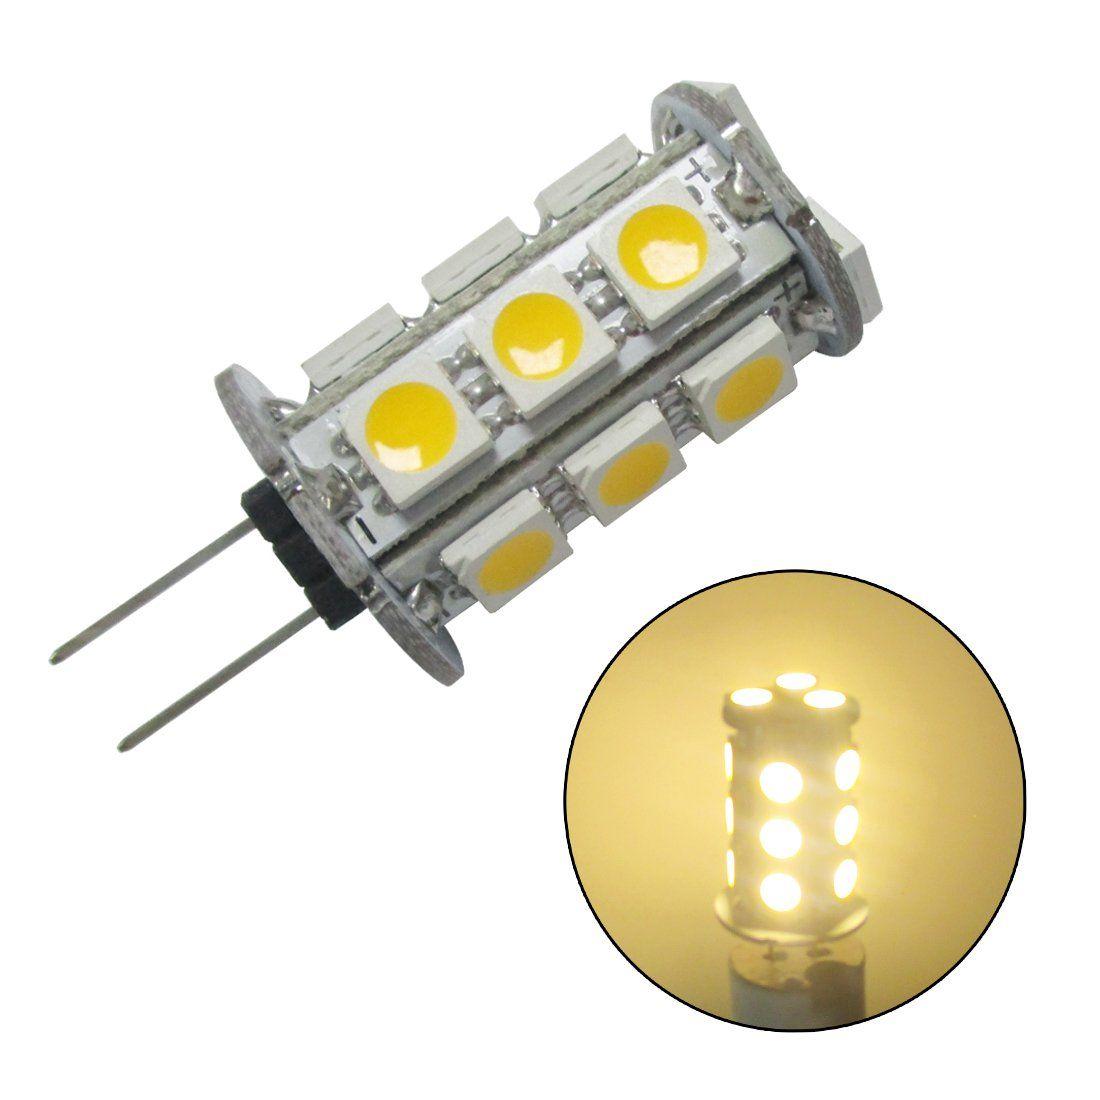 Grv G4 185050 Smd High Power Led Bulb Warm White Ac Dc 11v 24v Pack Of 6 Click The Image For Extra Details This Is An Affiliate Li Led Bulb Power Led Bulb